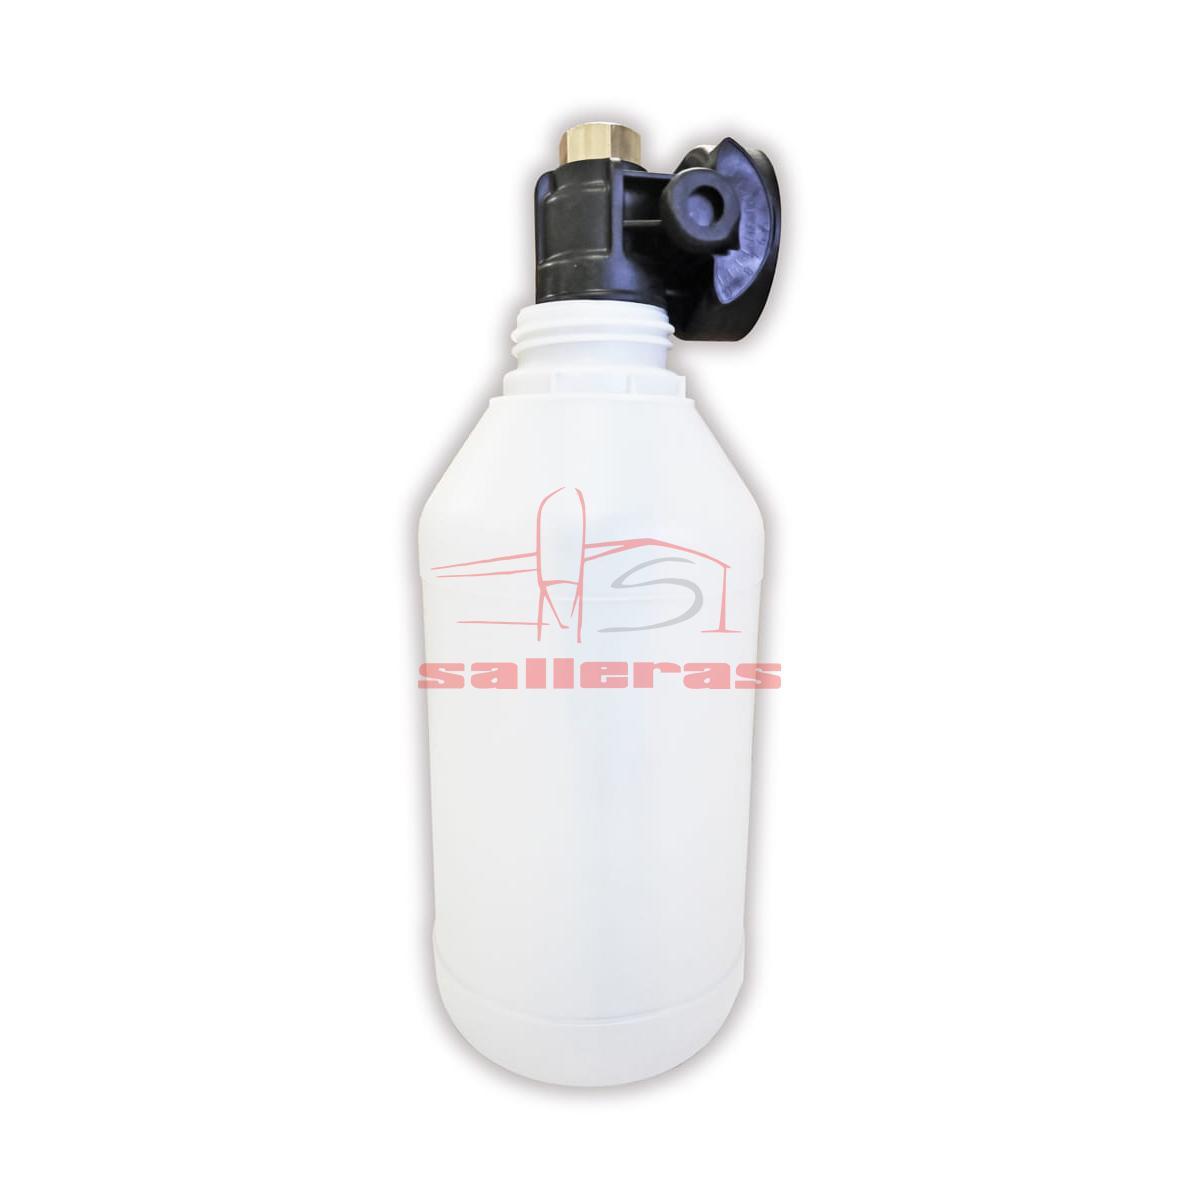 botella para lanzar espuma con deposito lateral